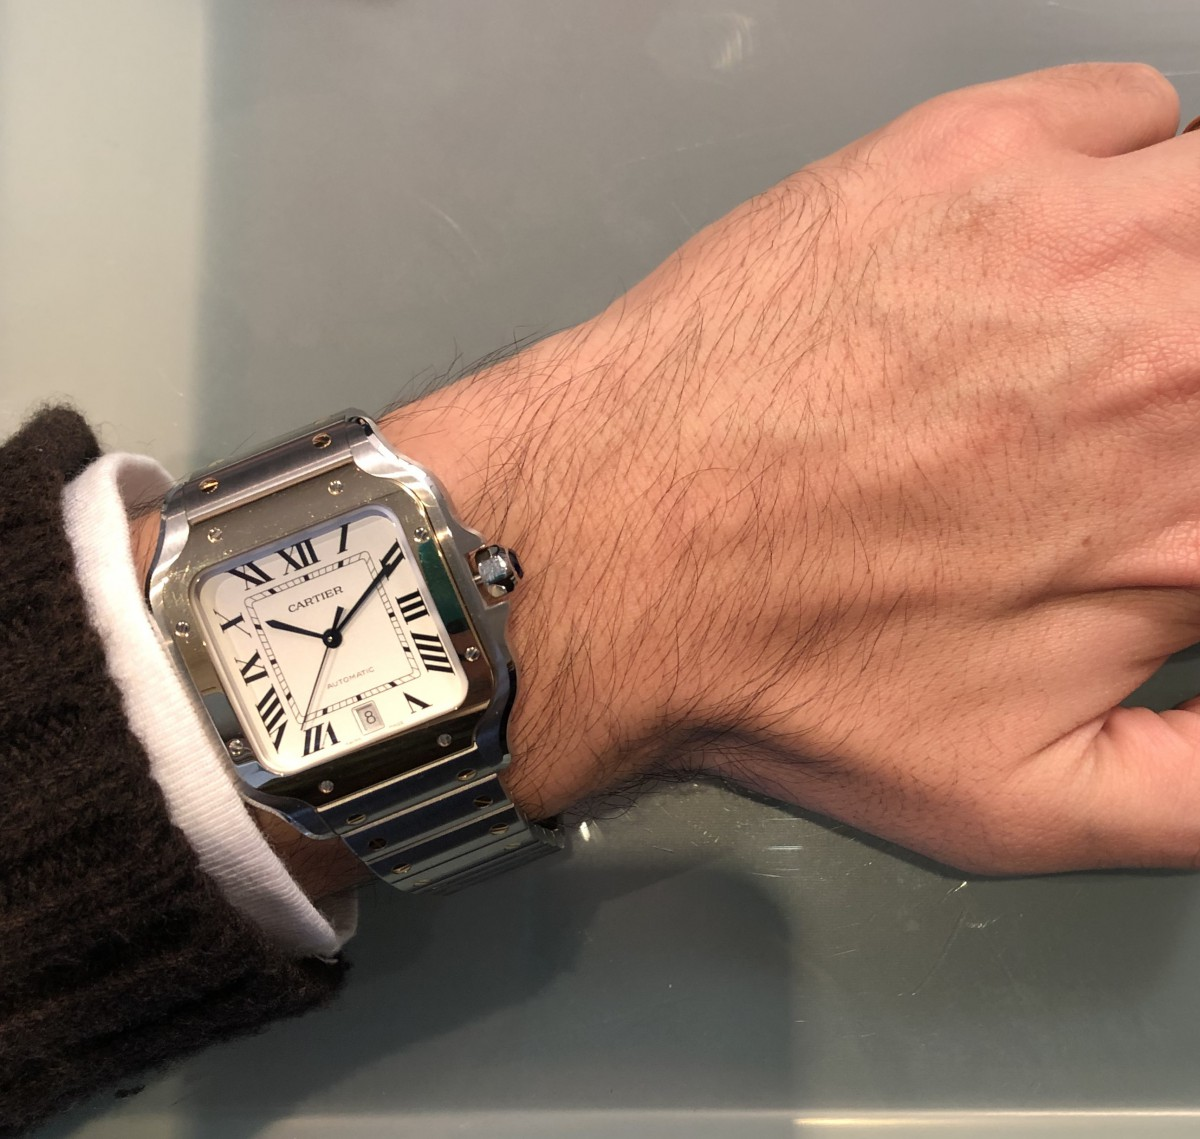 IMG_3945 モナコ、サントス、レベルソ。角型時計に悩める皆様へ、それぞれスタイルが全く違います!|関口 優